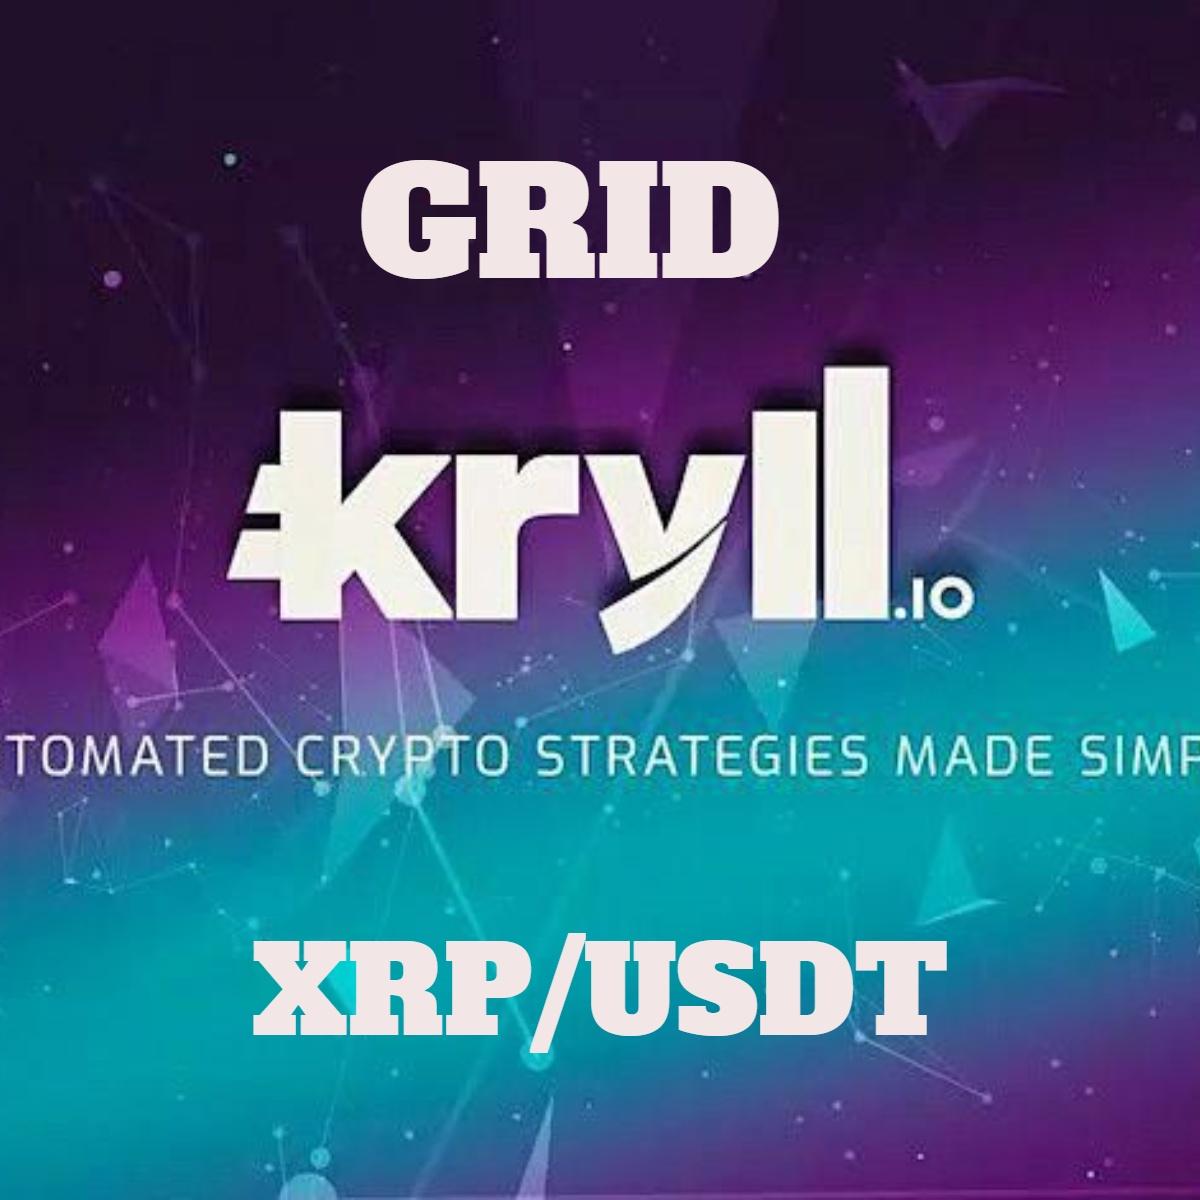 GRID XRP/USDT Kryll strategy poster